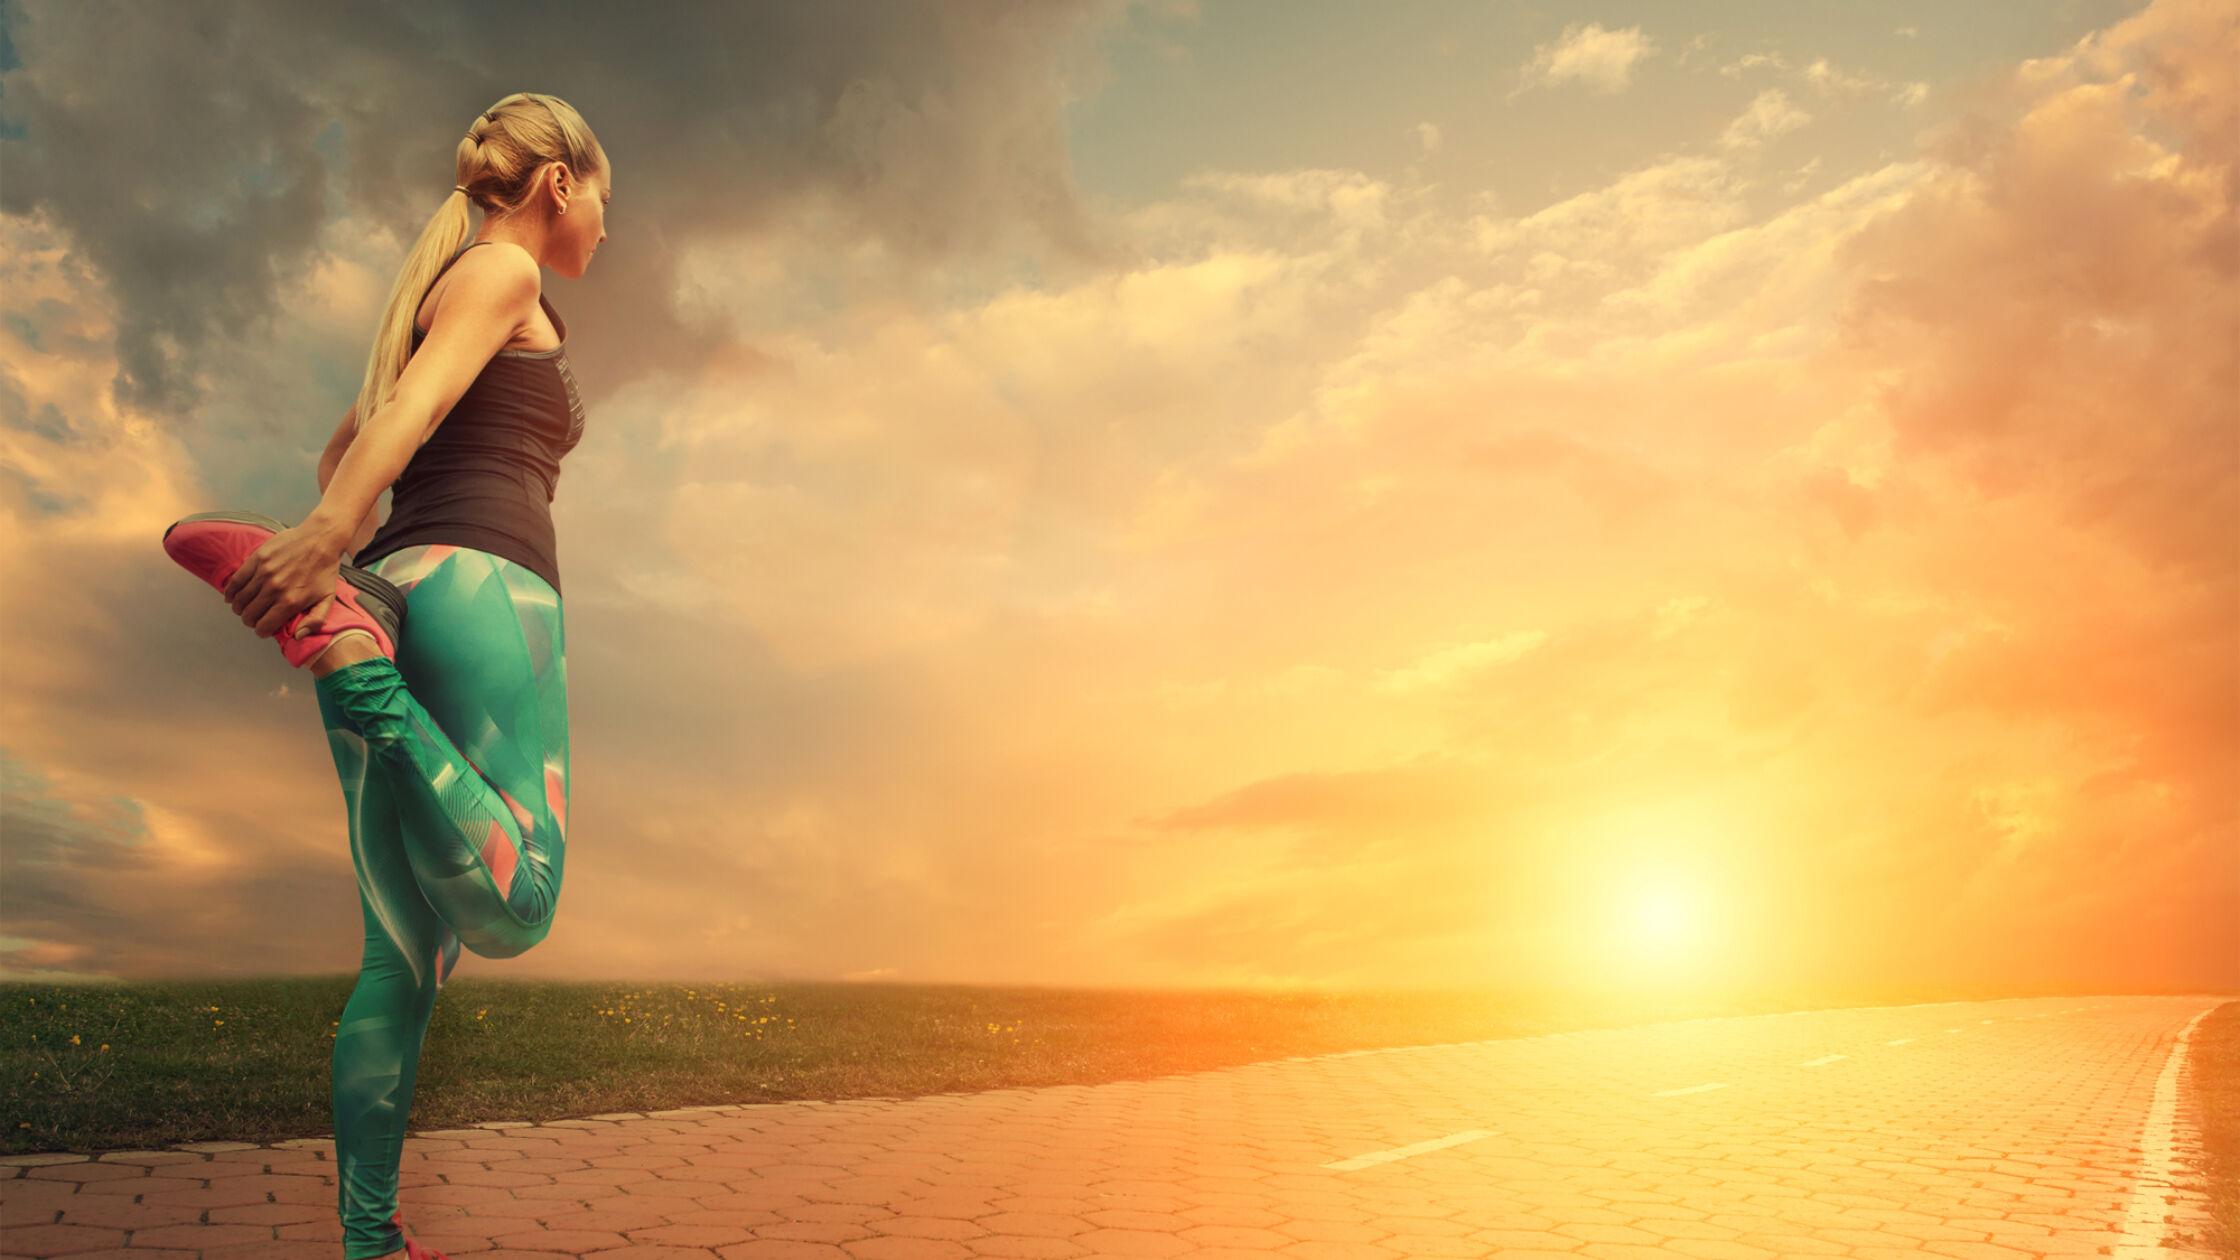 Voedingstip: Check of je extra vitamine D nodig hebt